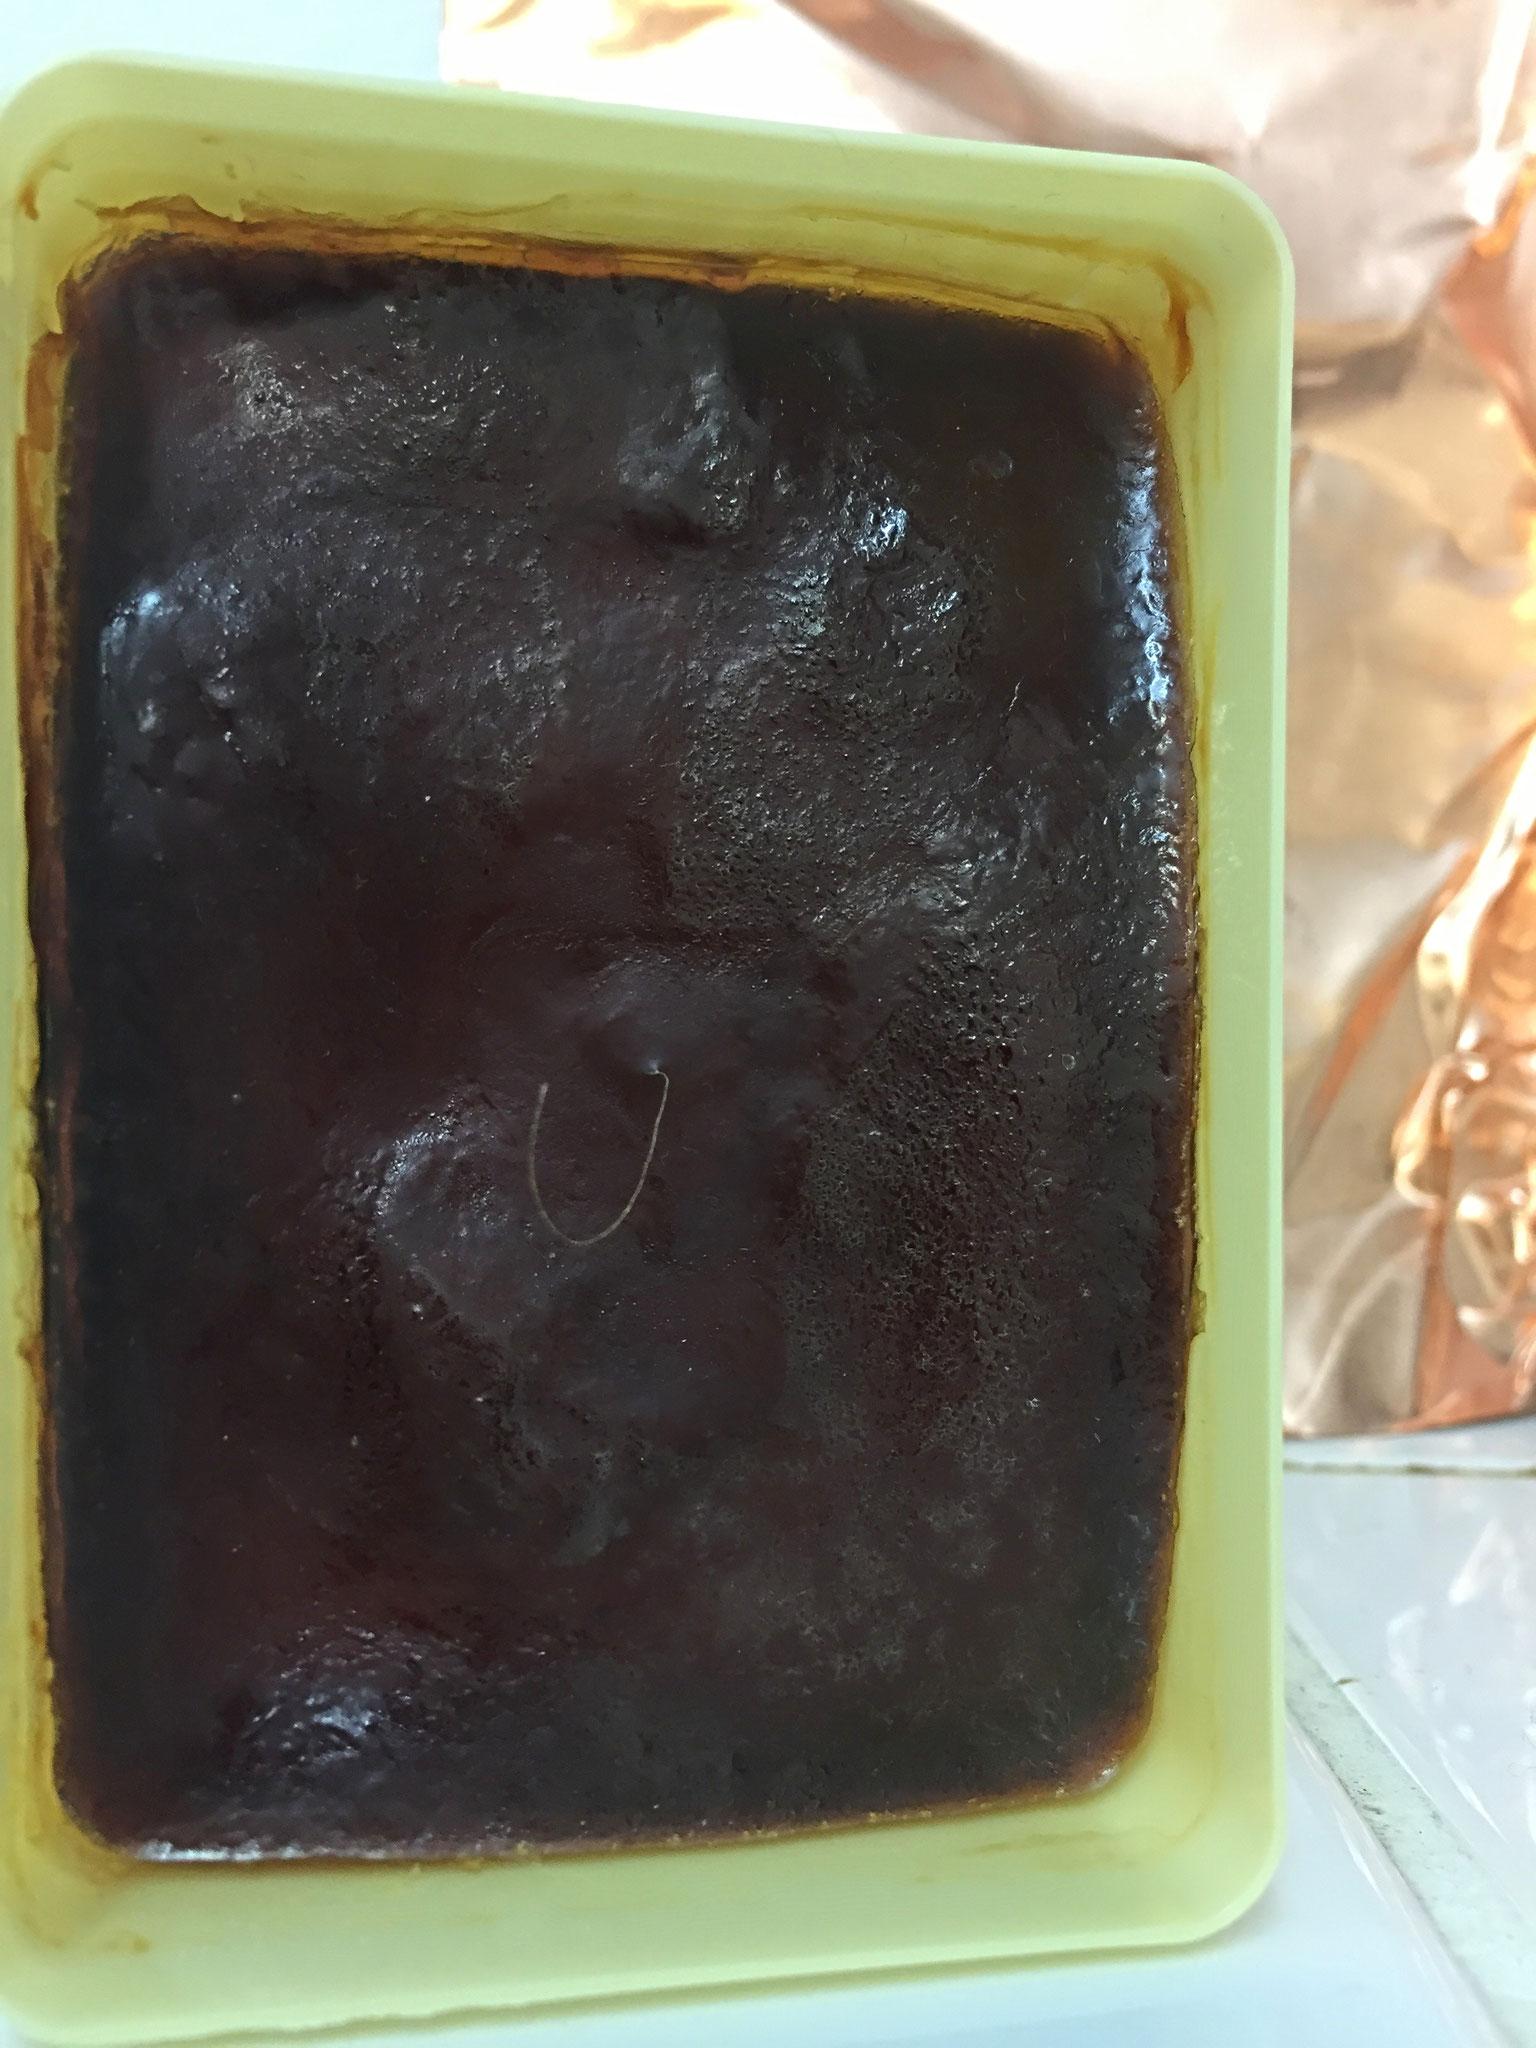 (2017, mixed media, copper, soap box, latex, pubic hair)